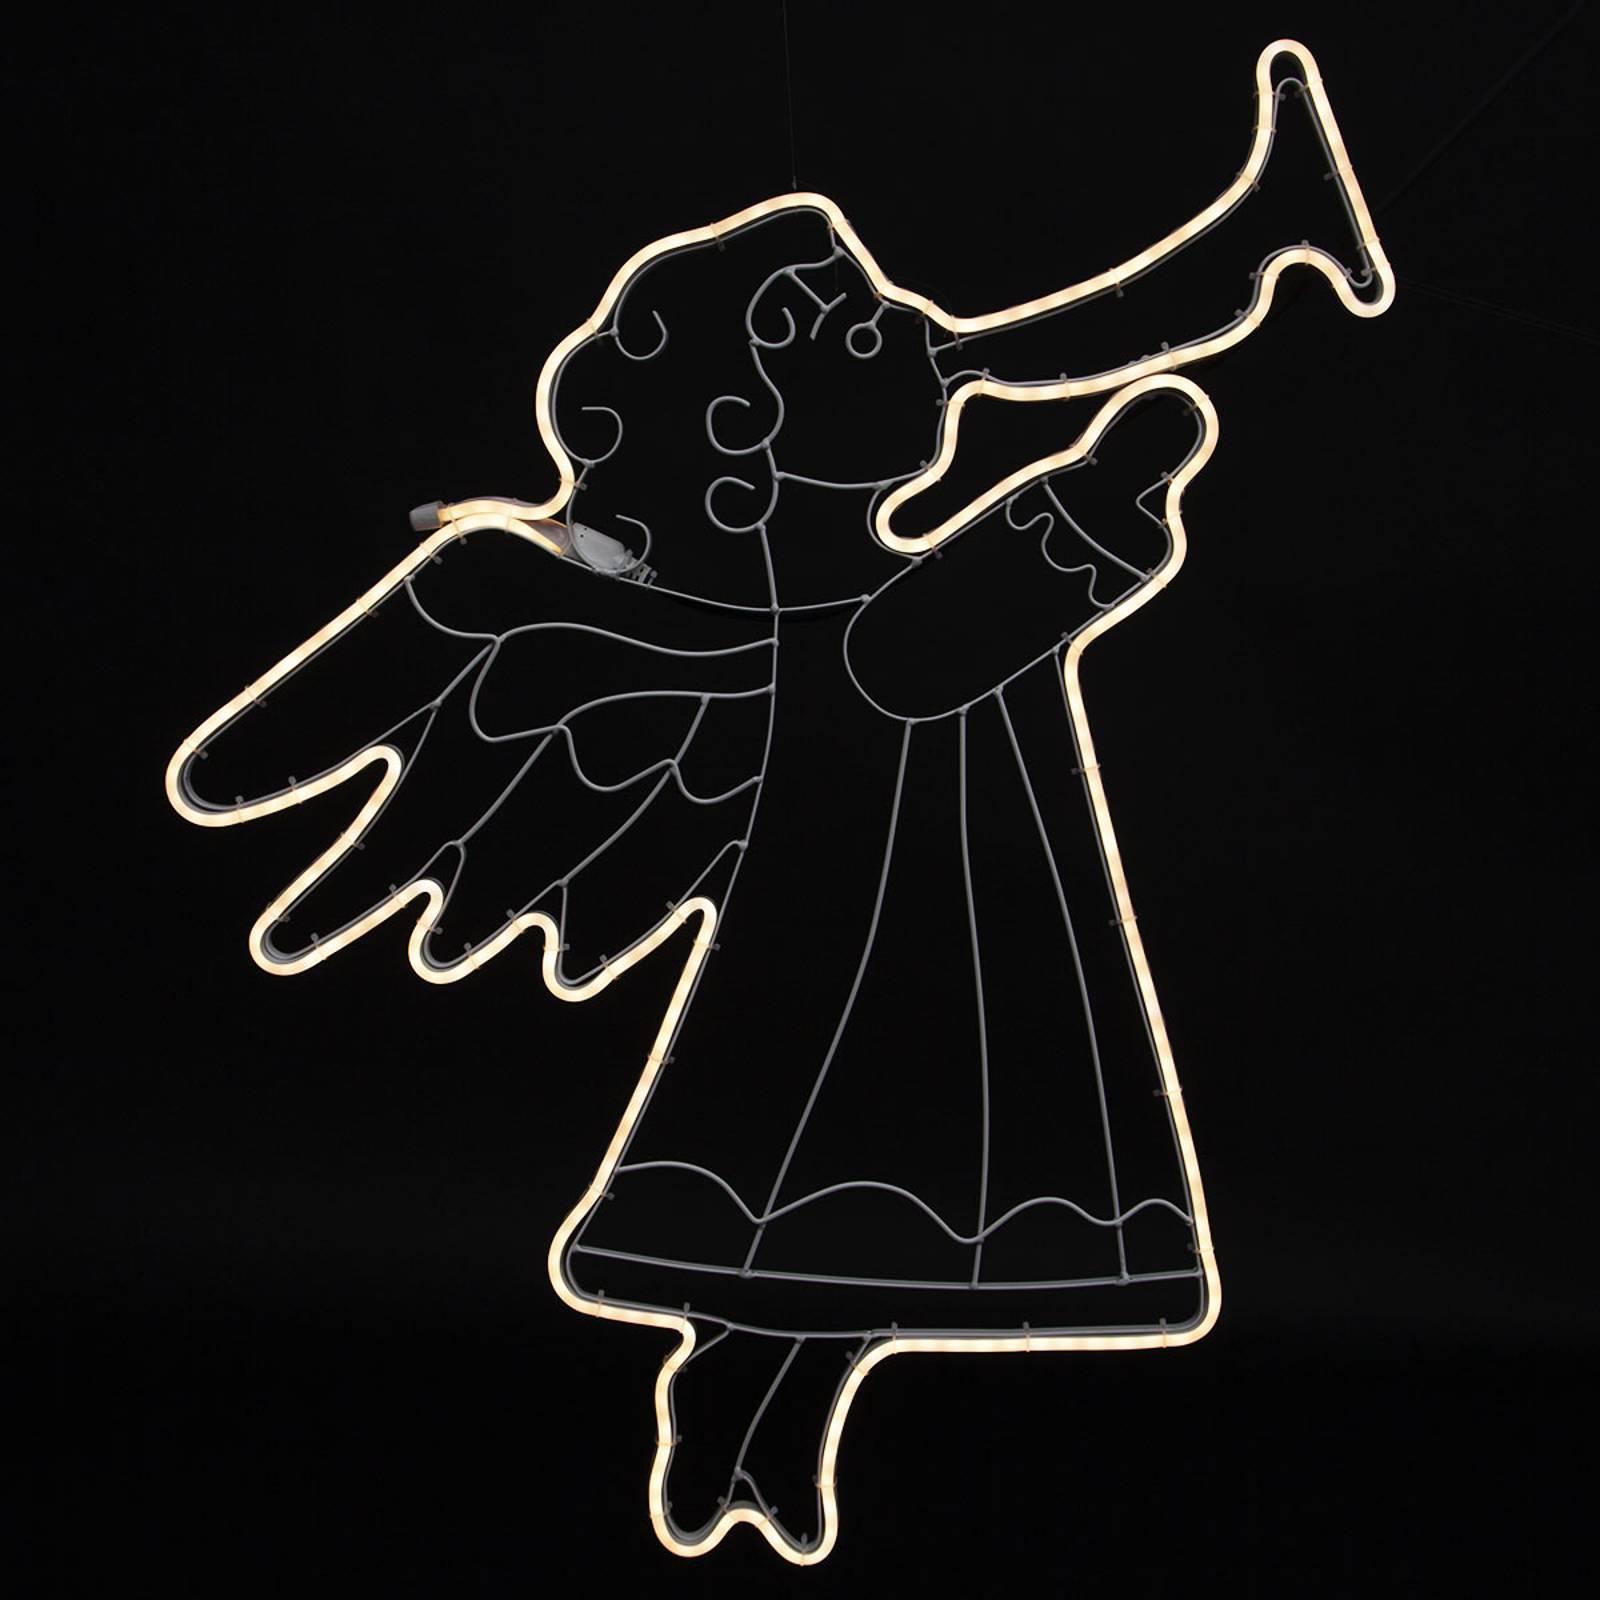 "*Merry X-Mas*: LED-Leuchtfigur ""Engel"" aus Kunststoff (Kopie) Lampenwelt"